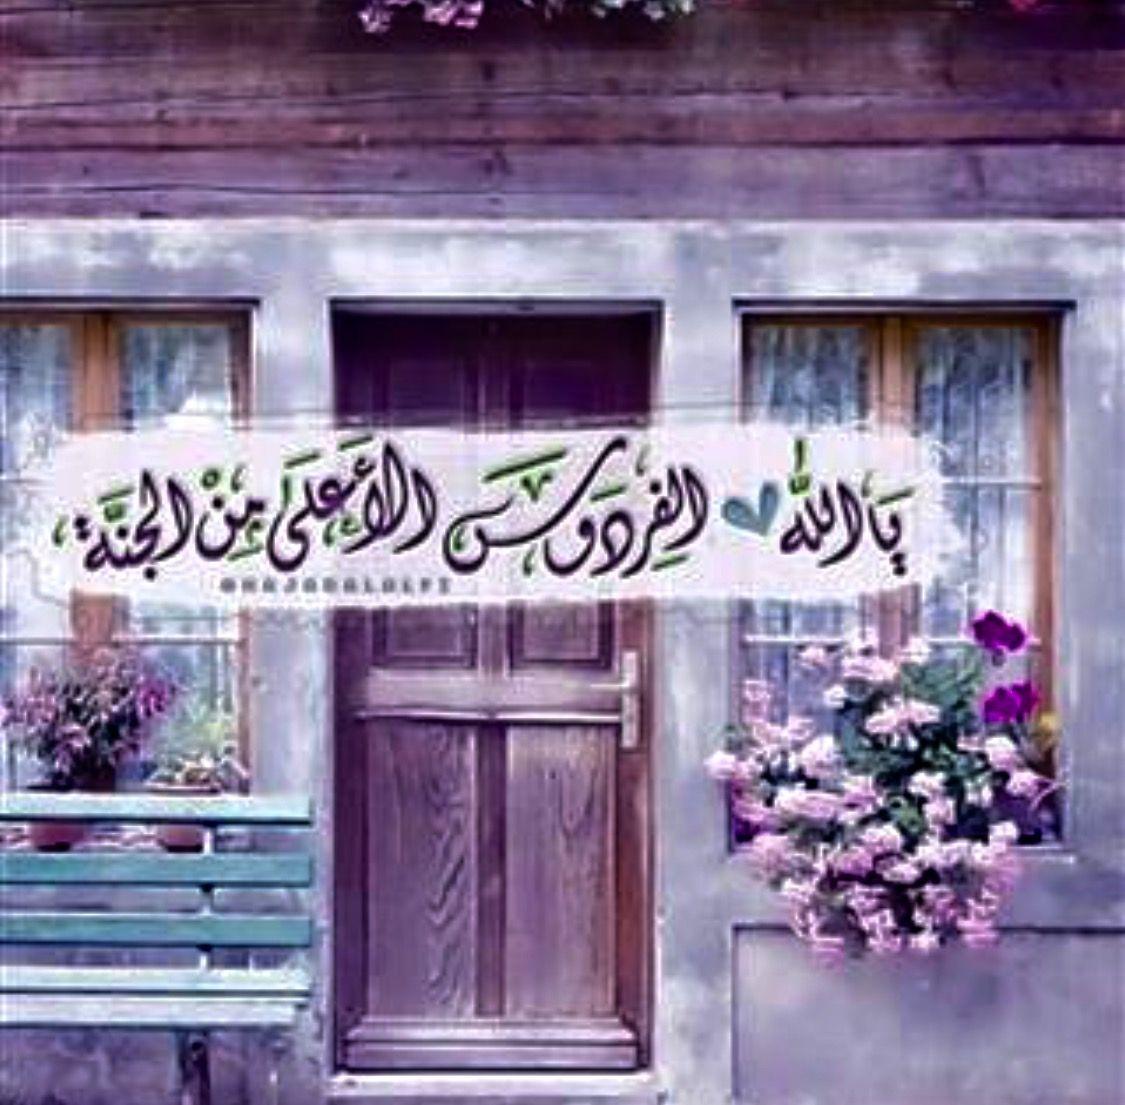 Desertrose اللهم ارزقنا الفردوس الأعلى من الجنة بلا حساب ولا سابق عذاب Neon Signs Neon Words